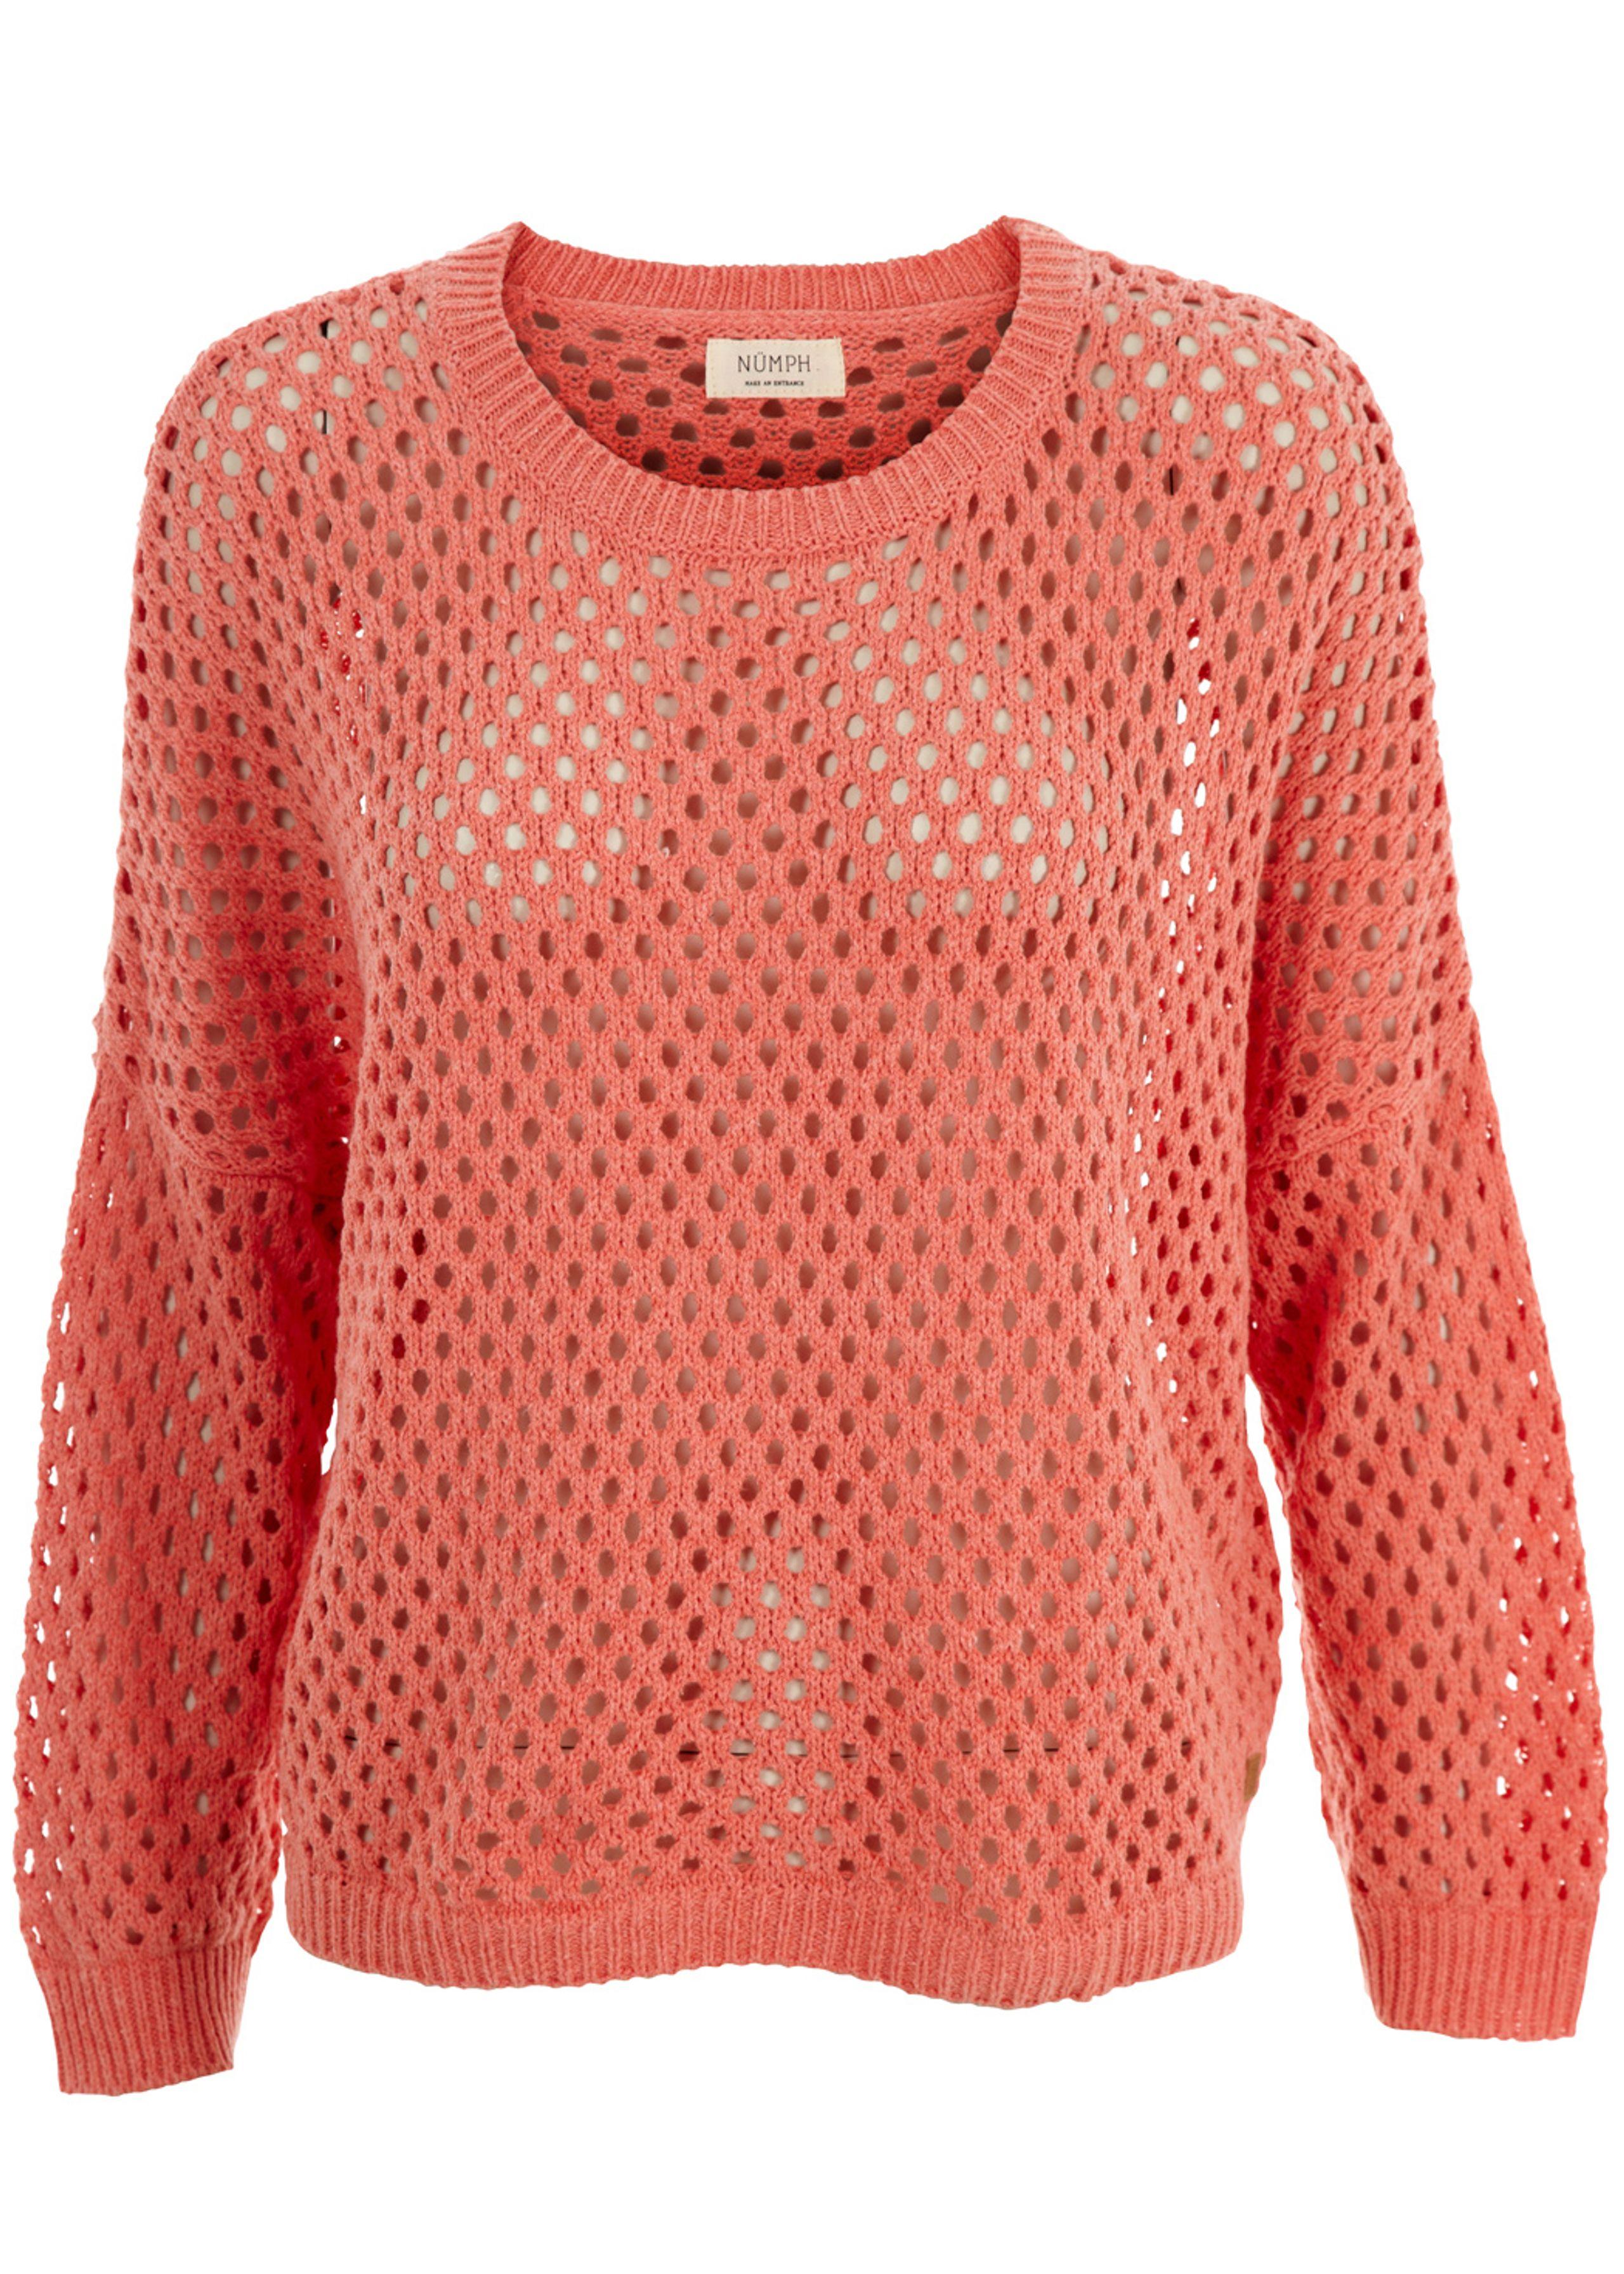 Babette knit